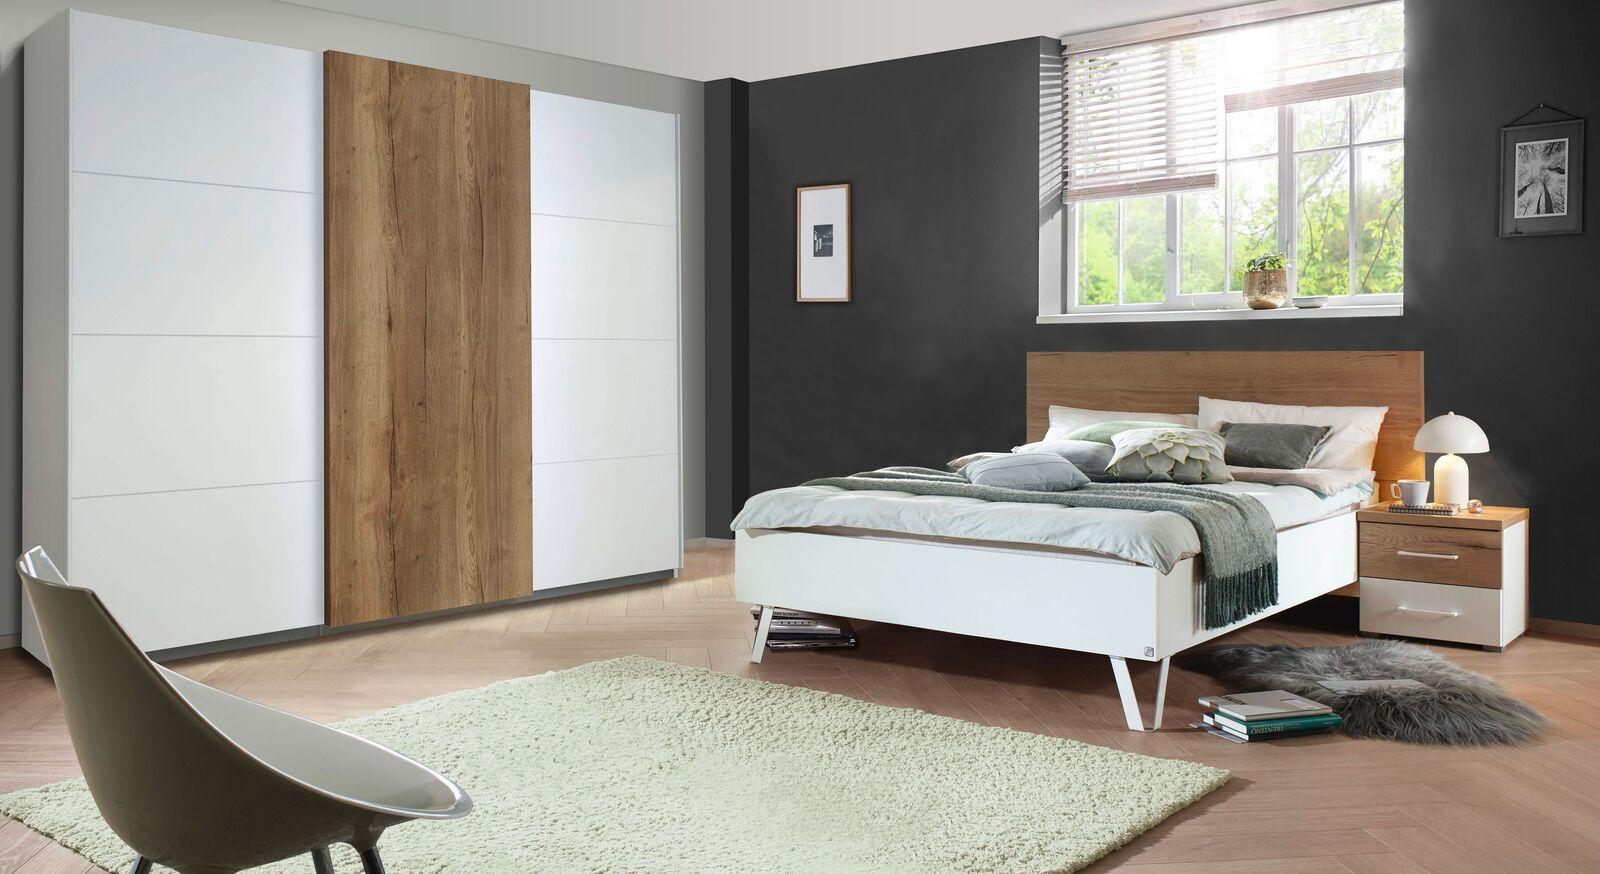 Komplett-Schlafzimmer Leona in schickem Design